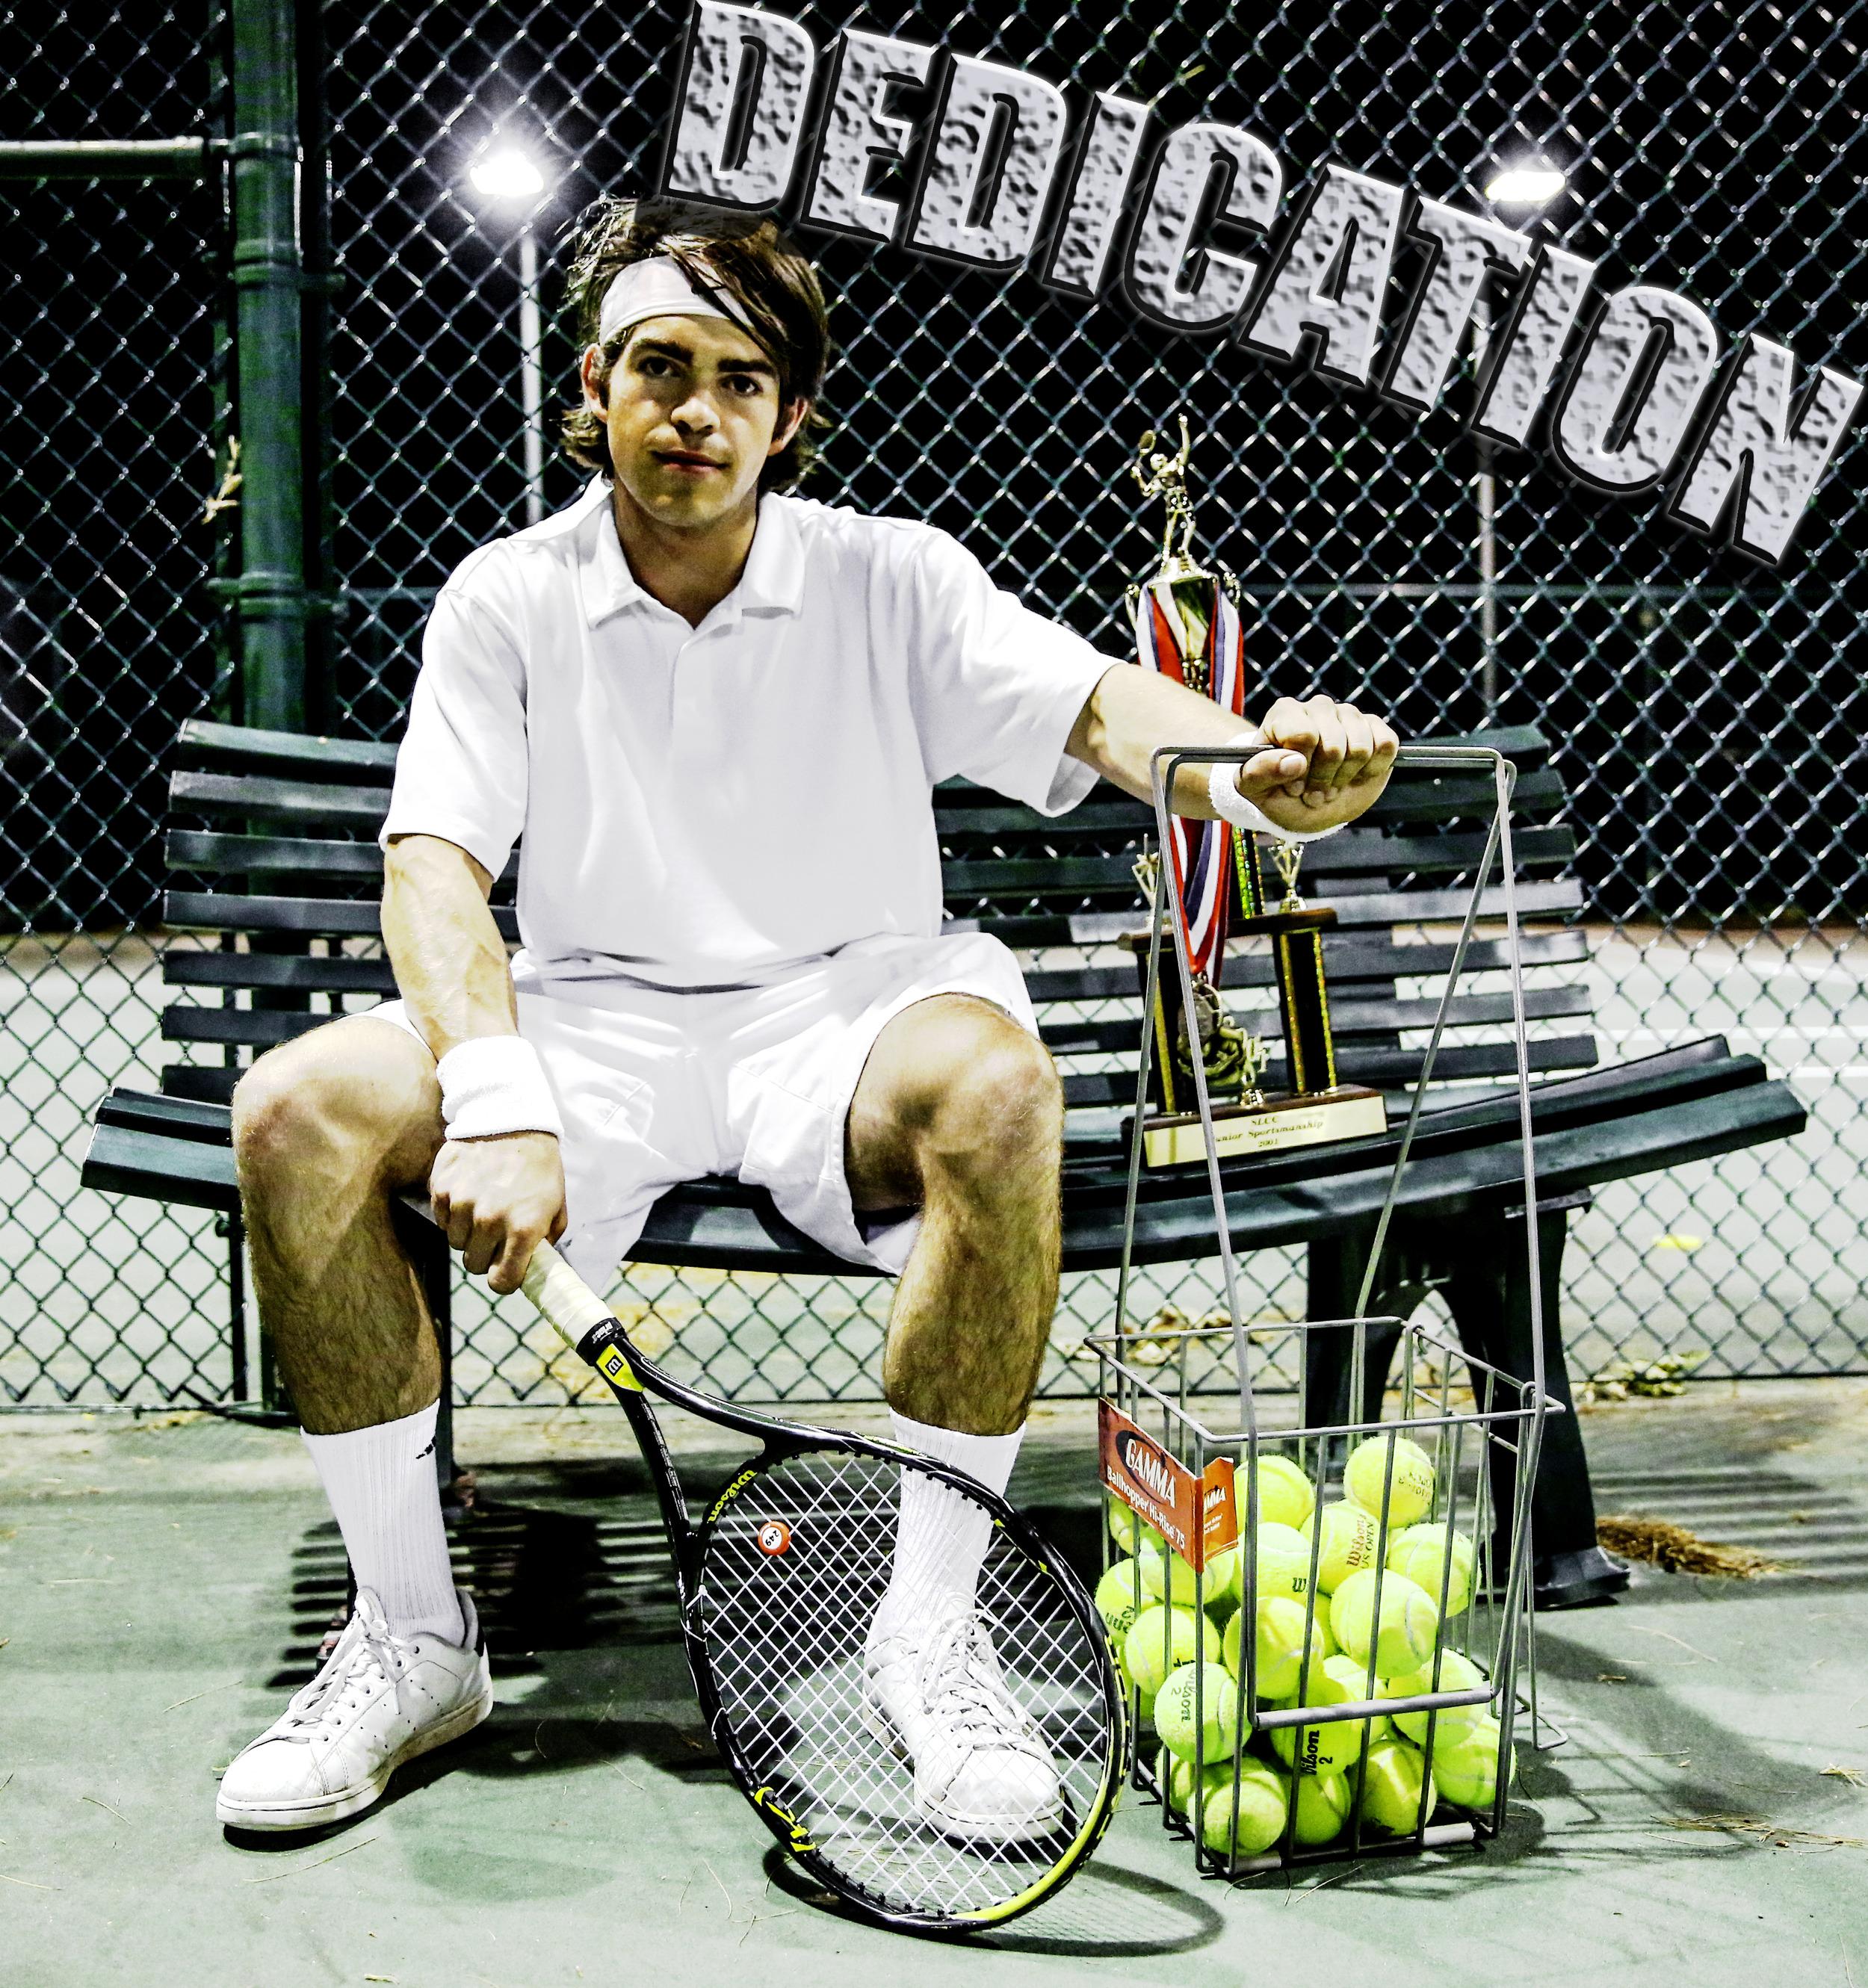 Location: The public tennis court nearest you!